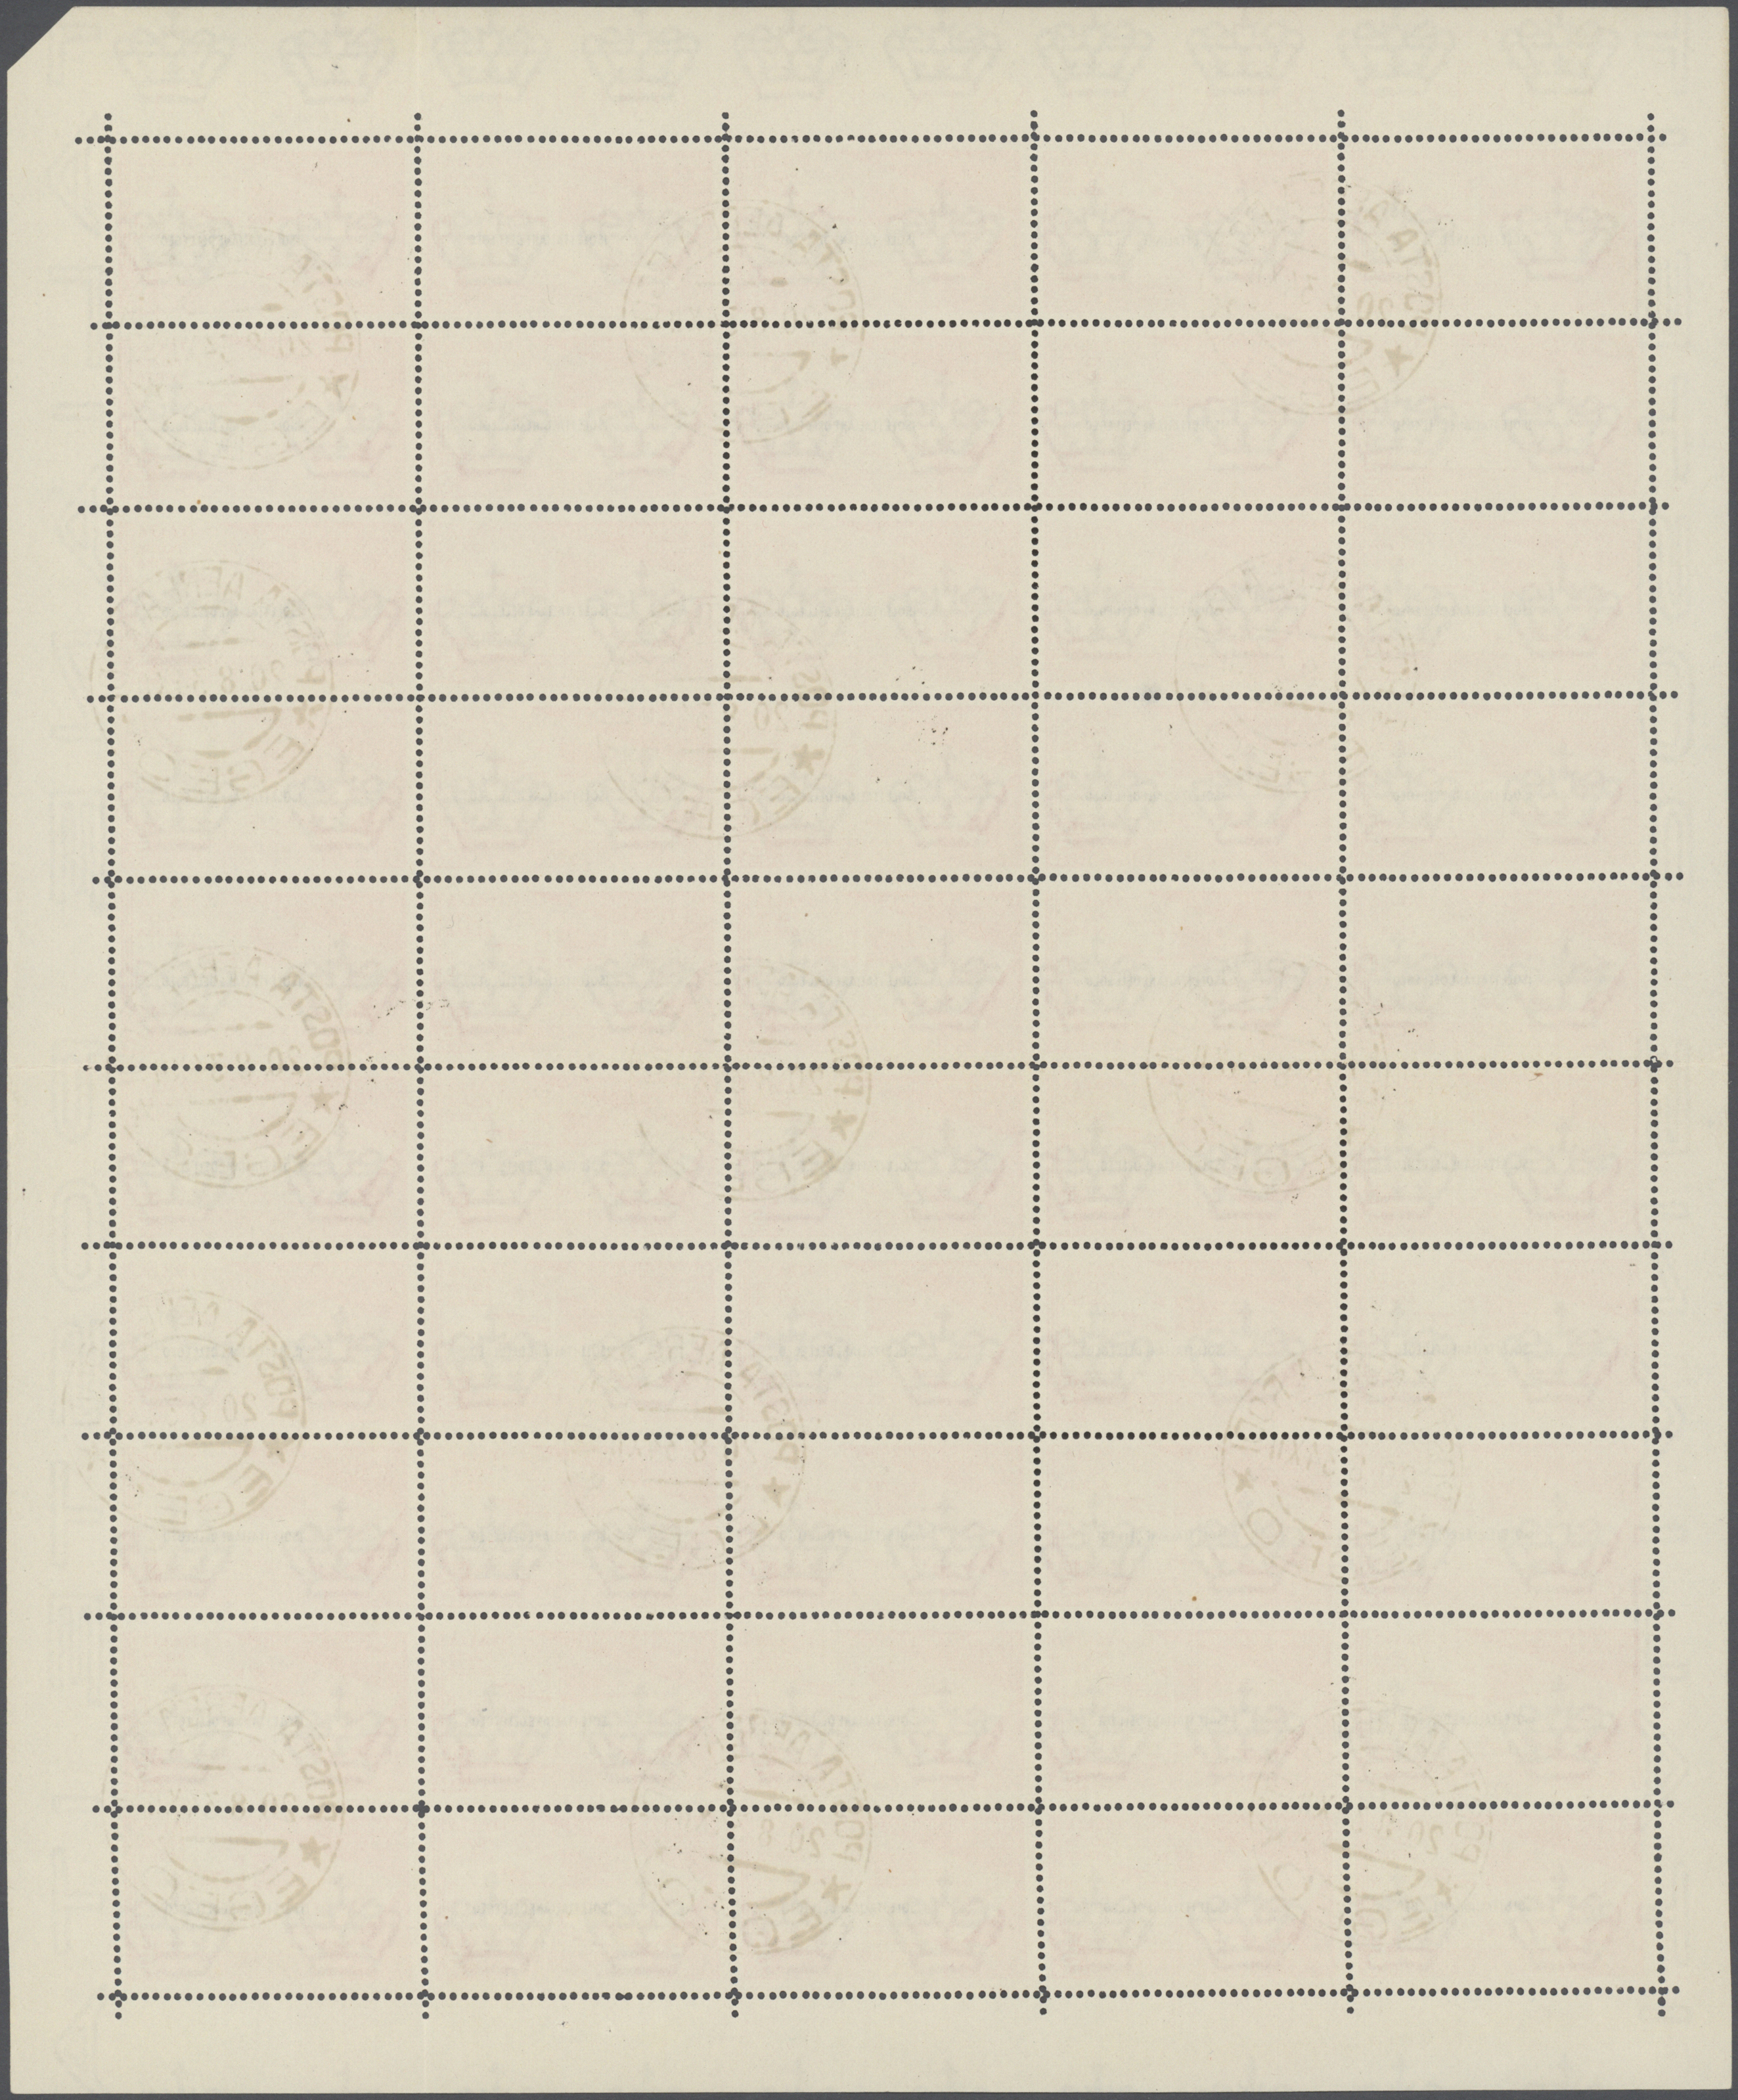 Lot 15008 - ägäische inseln  -  Auktionshaus Christoph Gärtner GmbH & Co. KG Sale #43 Germany / Europe | Day 5